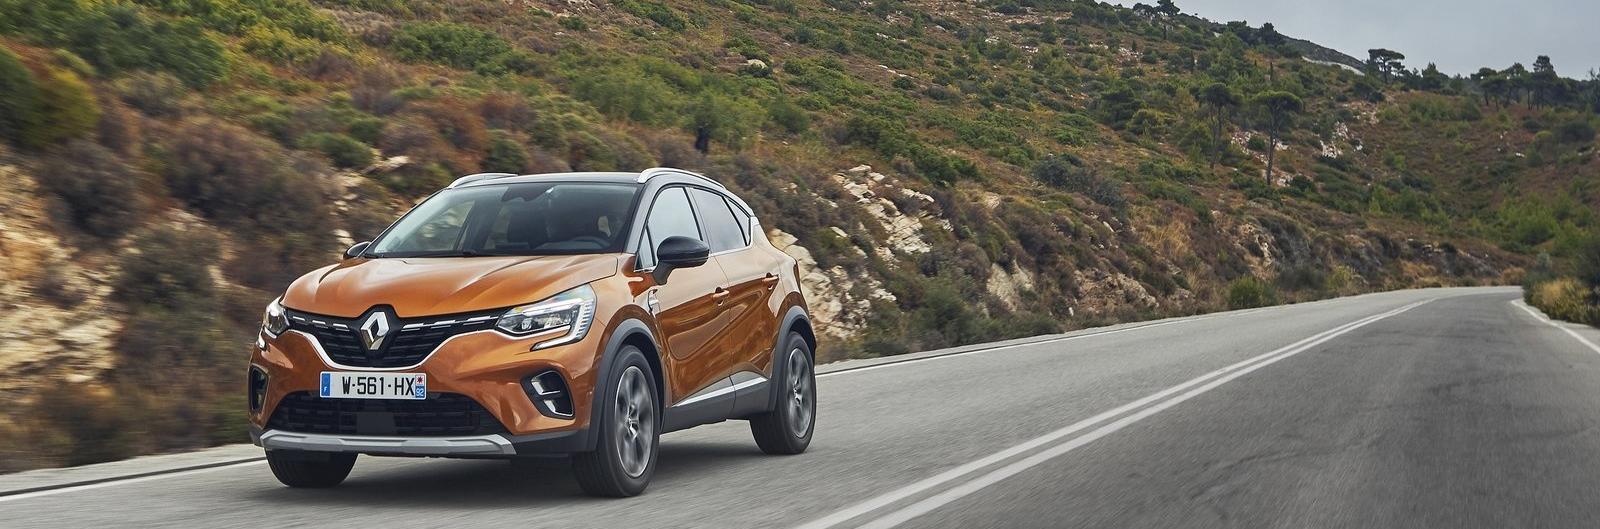 Renault Capture - garage goethals - wingene